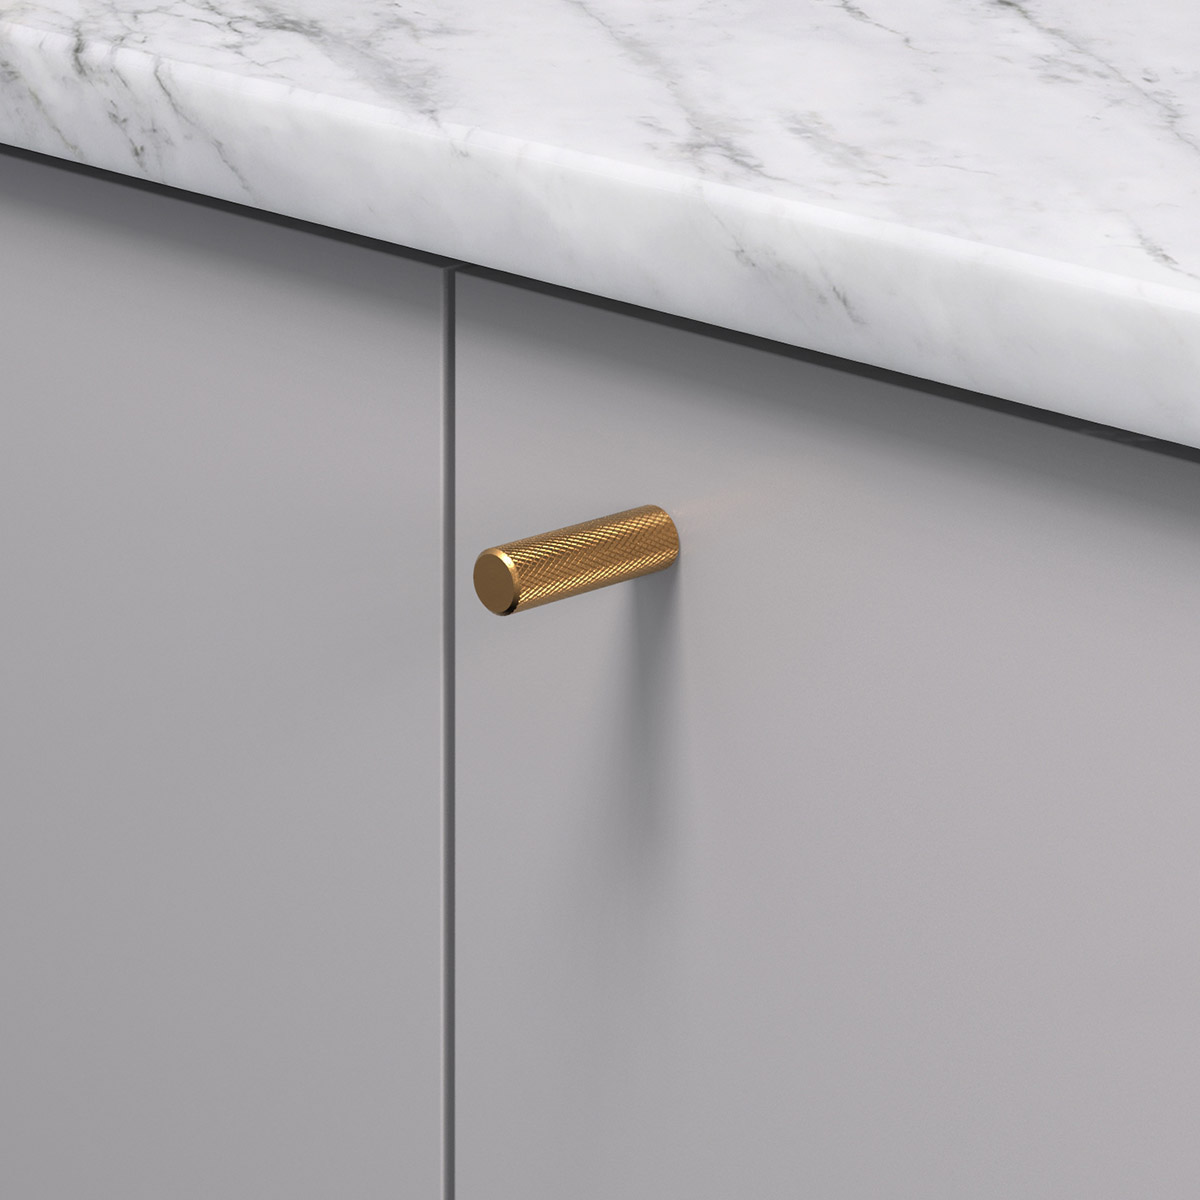 Knopp massing 370225 11 10 mm ncs s 4500 n marmor carrara